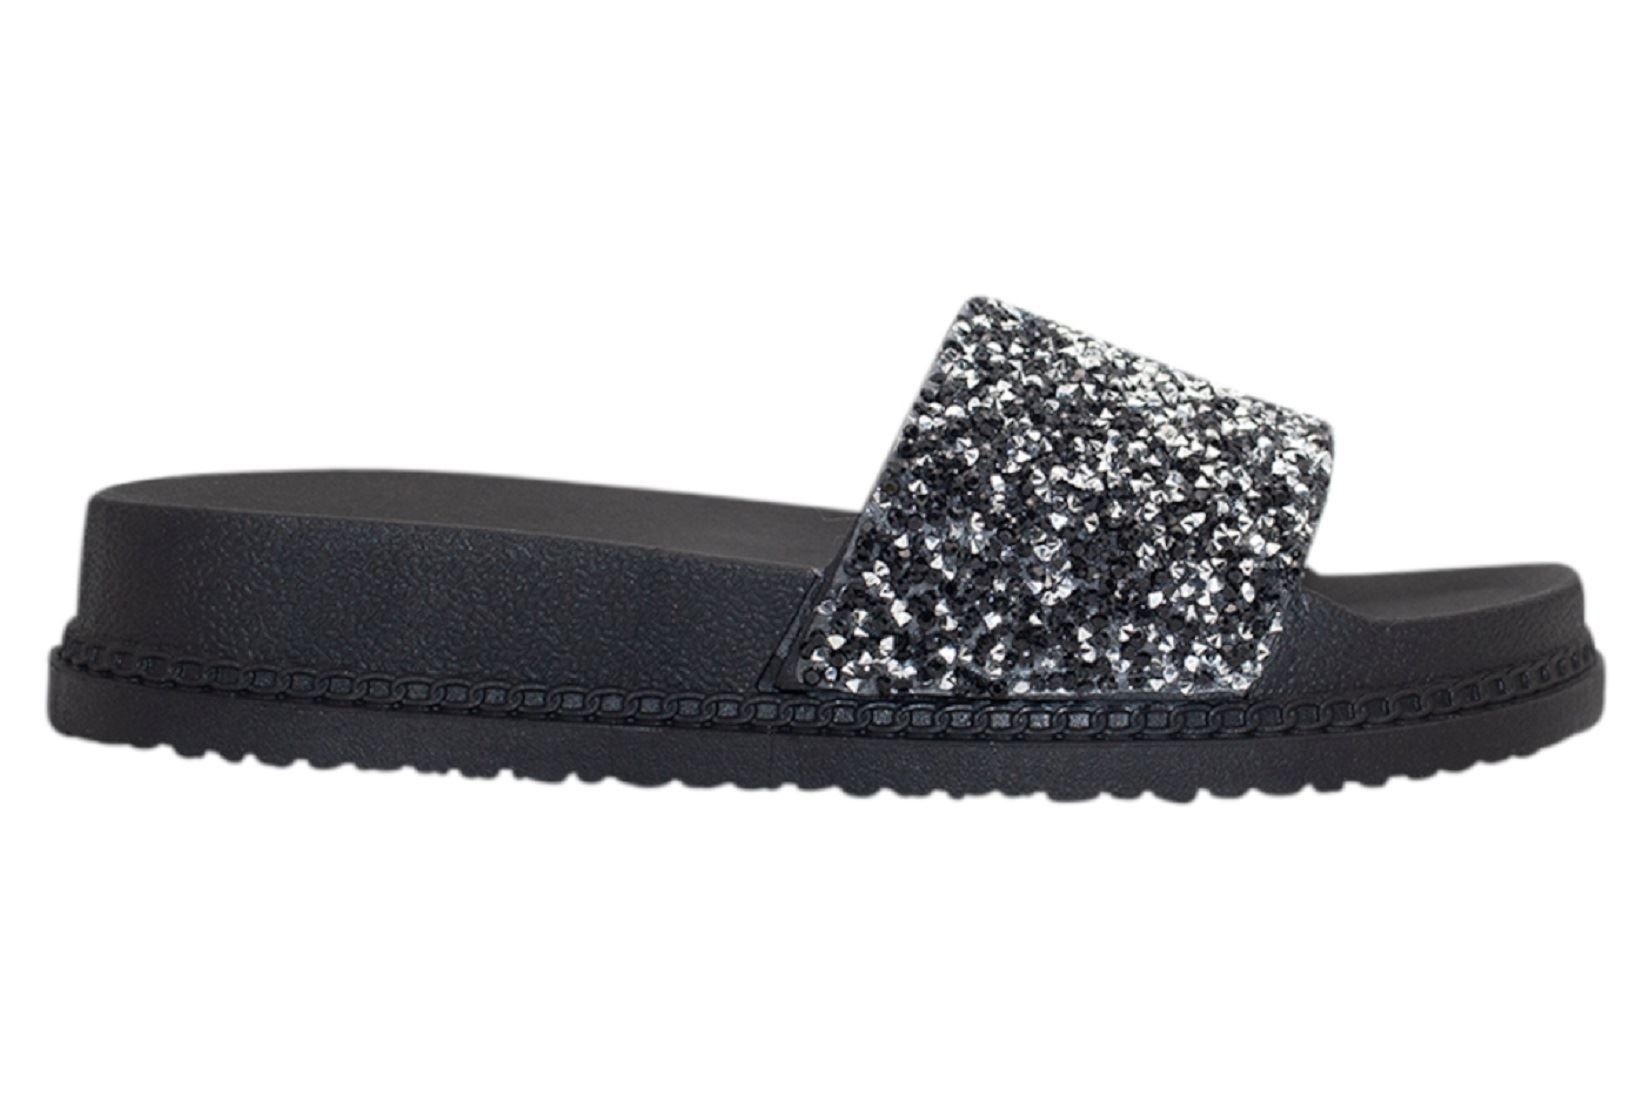 Womens-Sliders-Casual-Slippers-Mules-Ladies-Diamante-Flip-Flop-Sandals-Shoes thumbnail 6